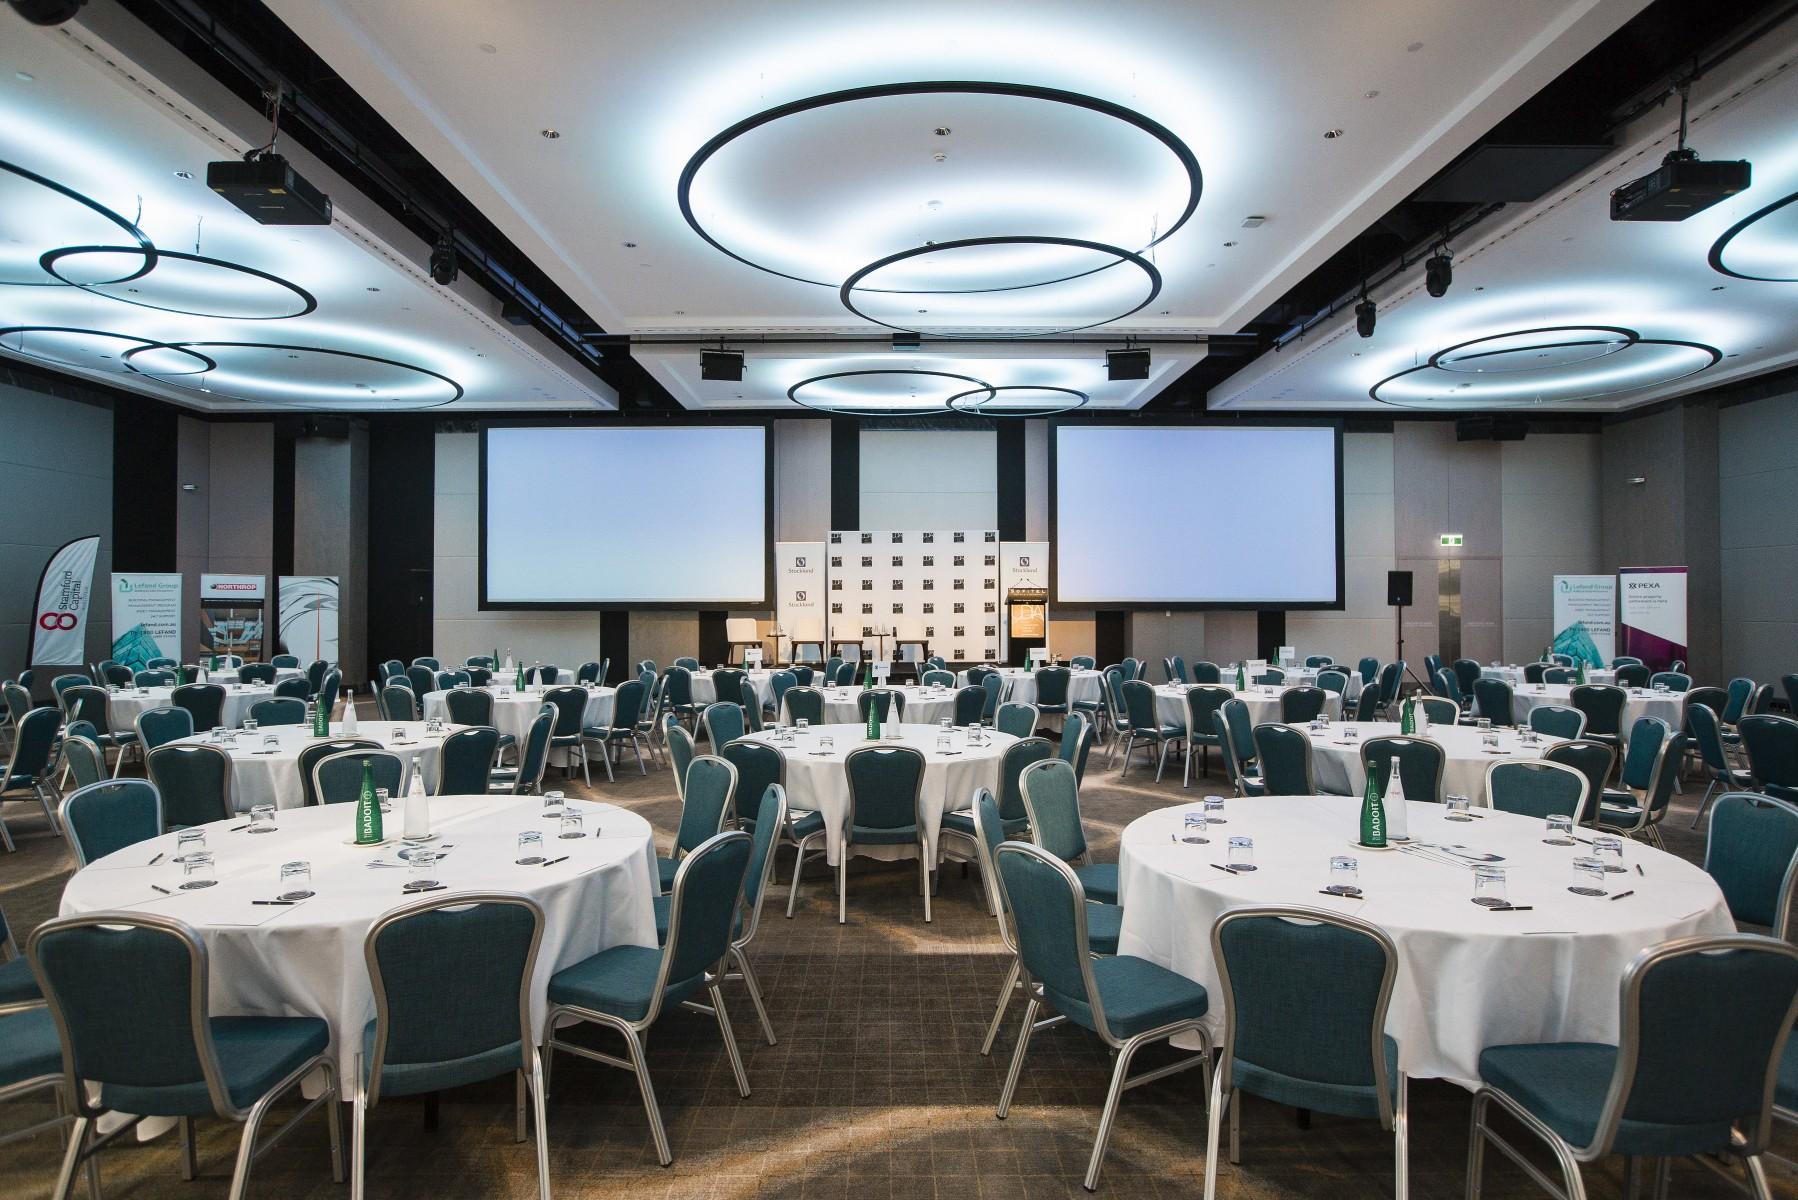 Sofitel-Sydney-Darling-Harbour-Ballroom-2.jpg